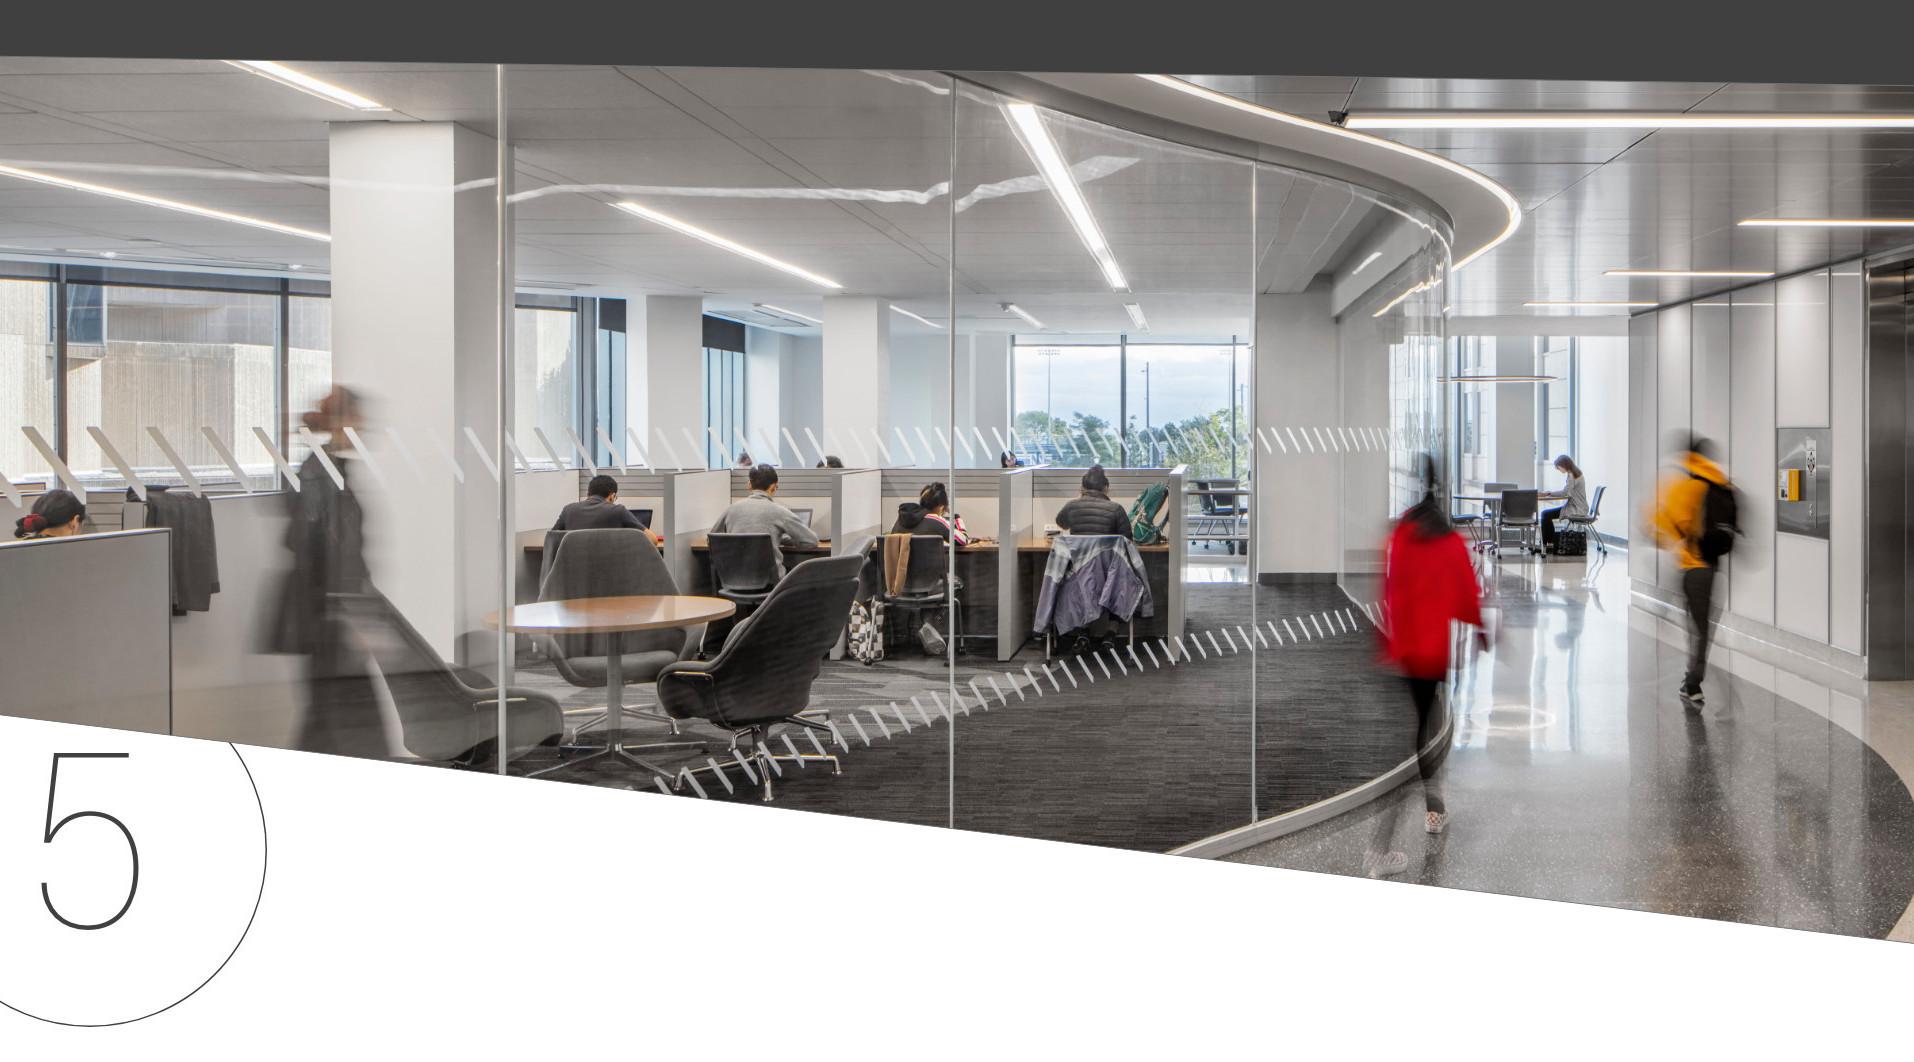 Flad Architects Northwestern University Seeley G. Mudd Engineering Library